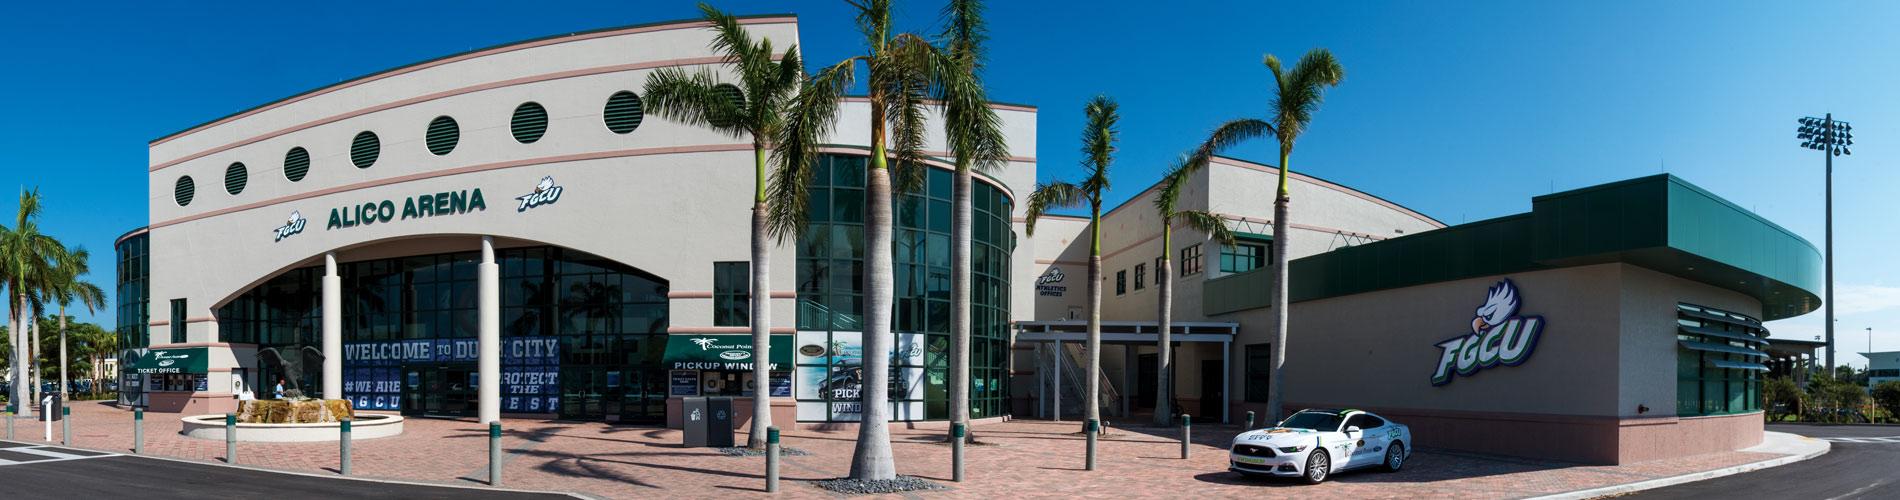 Alico Arena Expansion